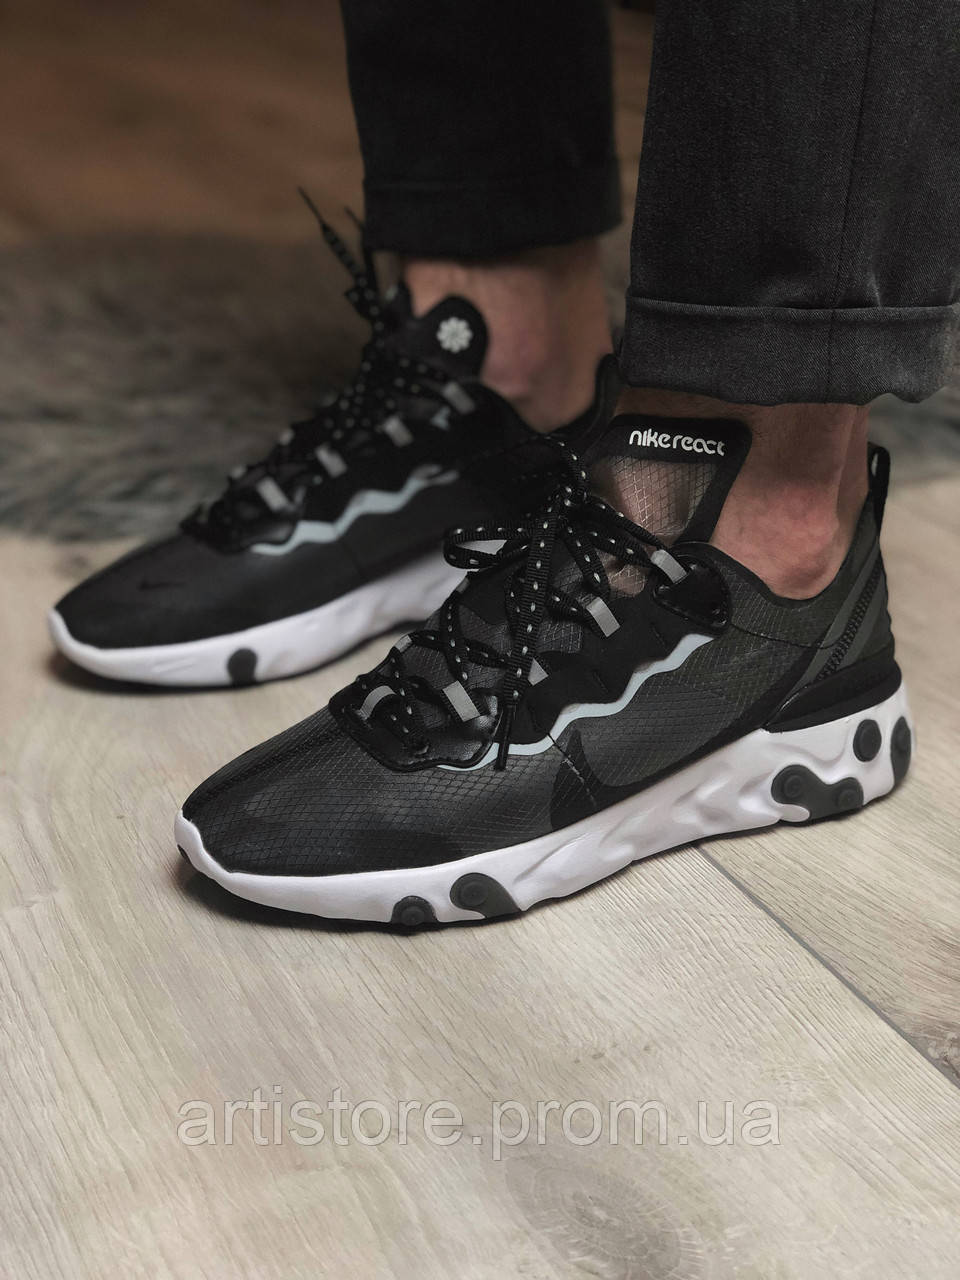 Кроссовки Nike Undercover React Element 87 Black with grey Черные с серым